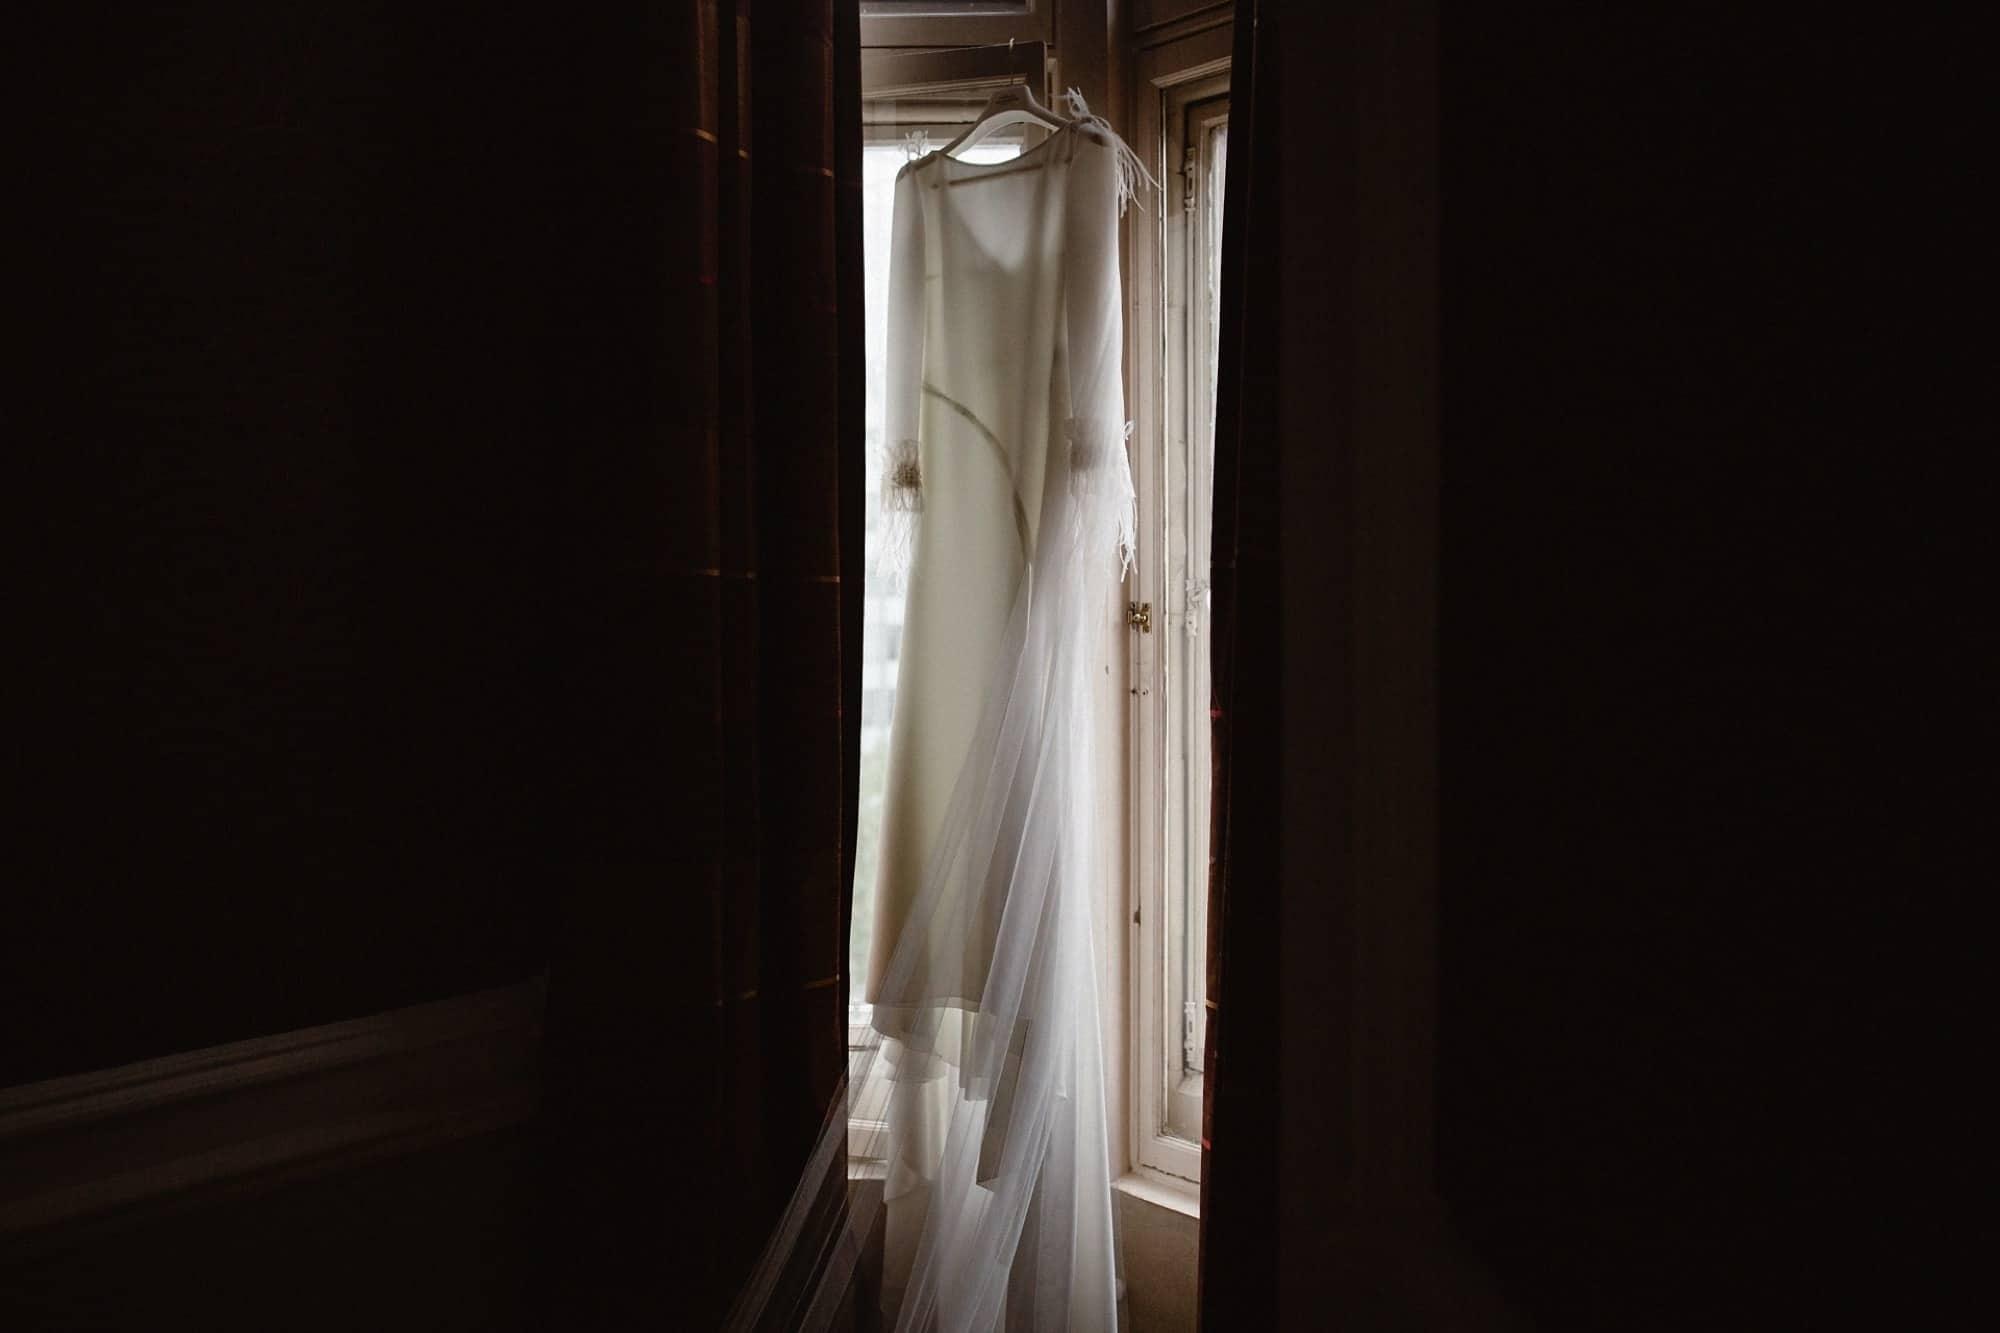 Pronovias Atelier wedding dress hanging in the window